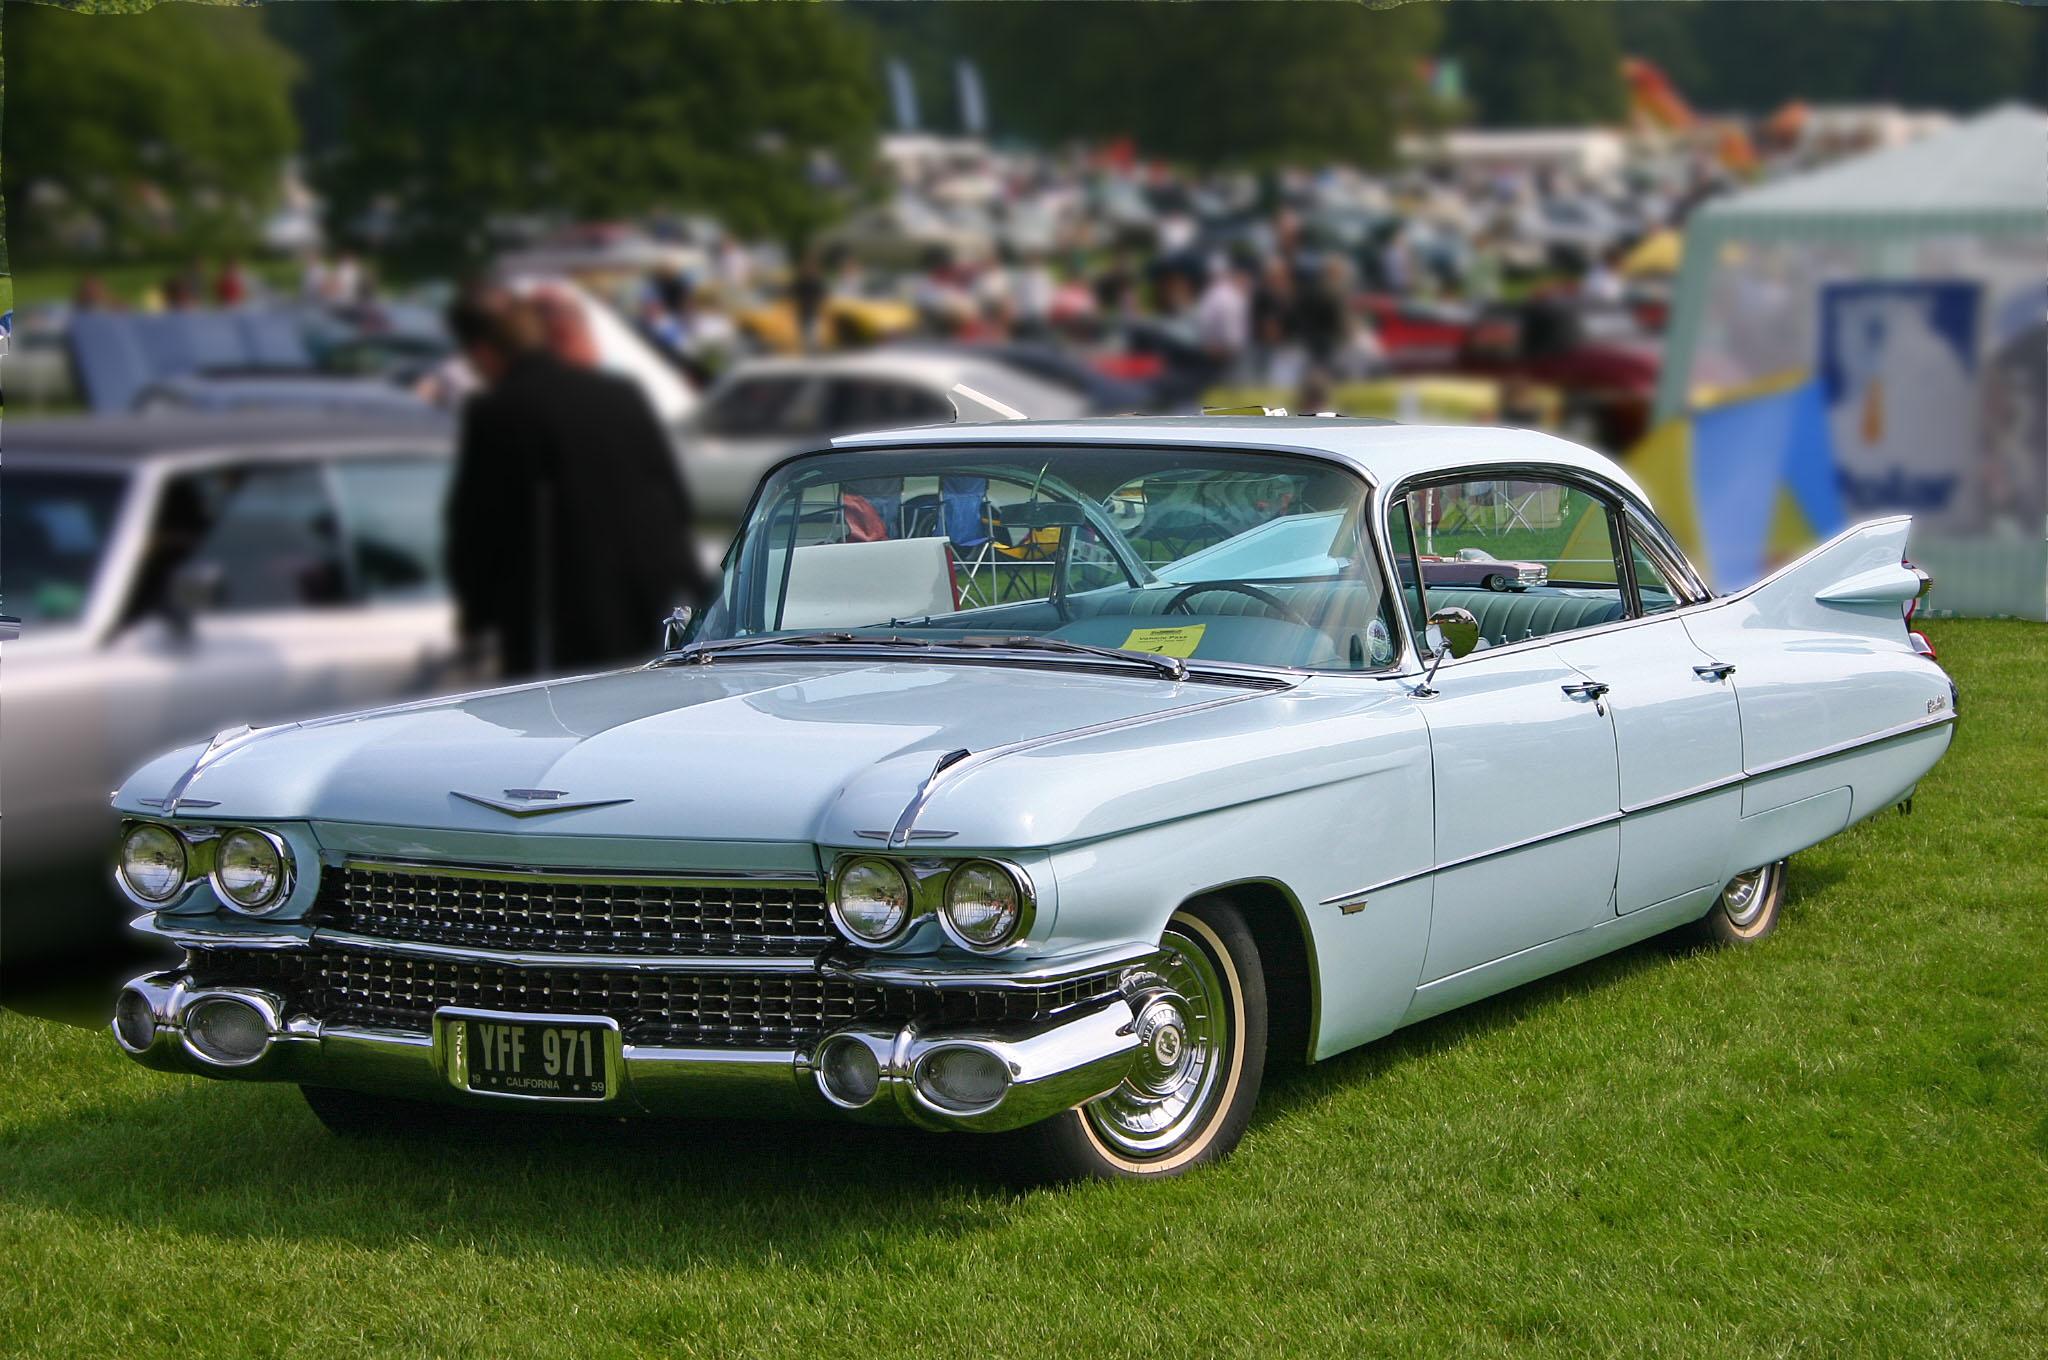 File:Cadillac Sedan de Ville 1959 front.jpg - Wikimedia Commons